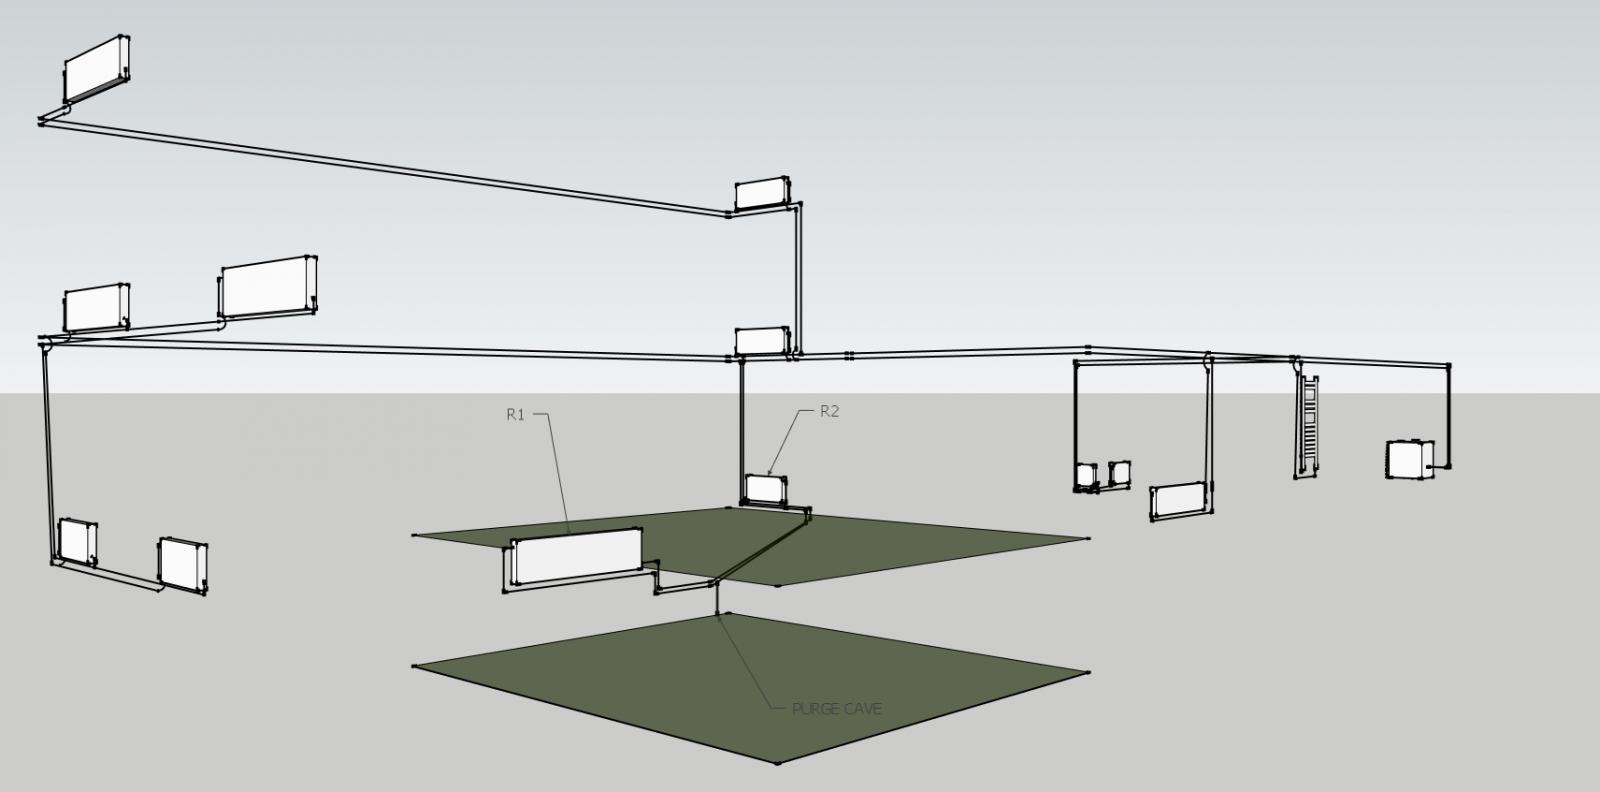 purger mon circuit de chauffage. Black Bedroom Furniture Sets. Home Design Ideas